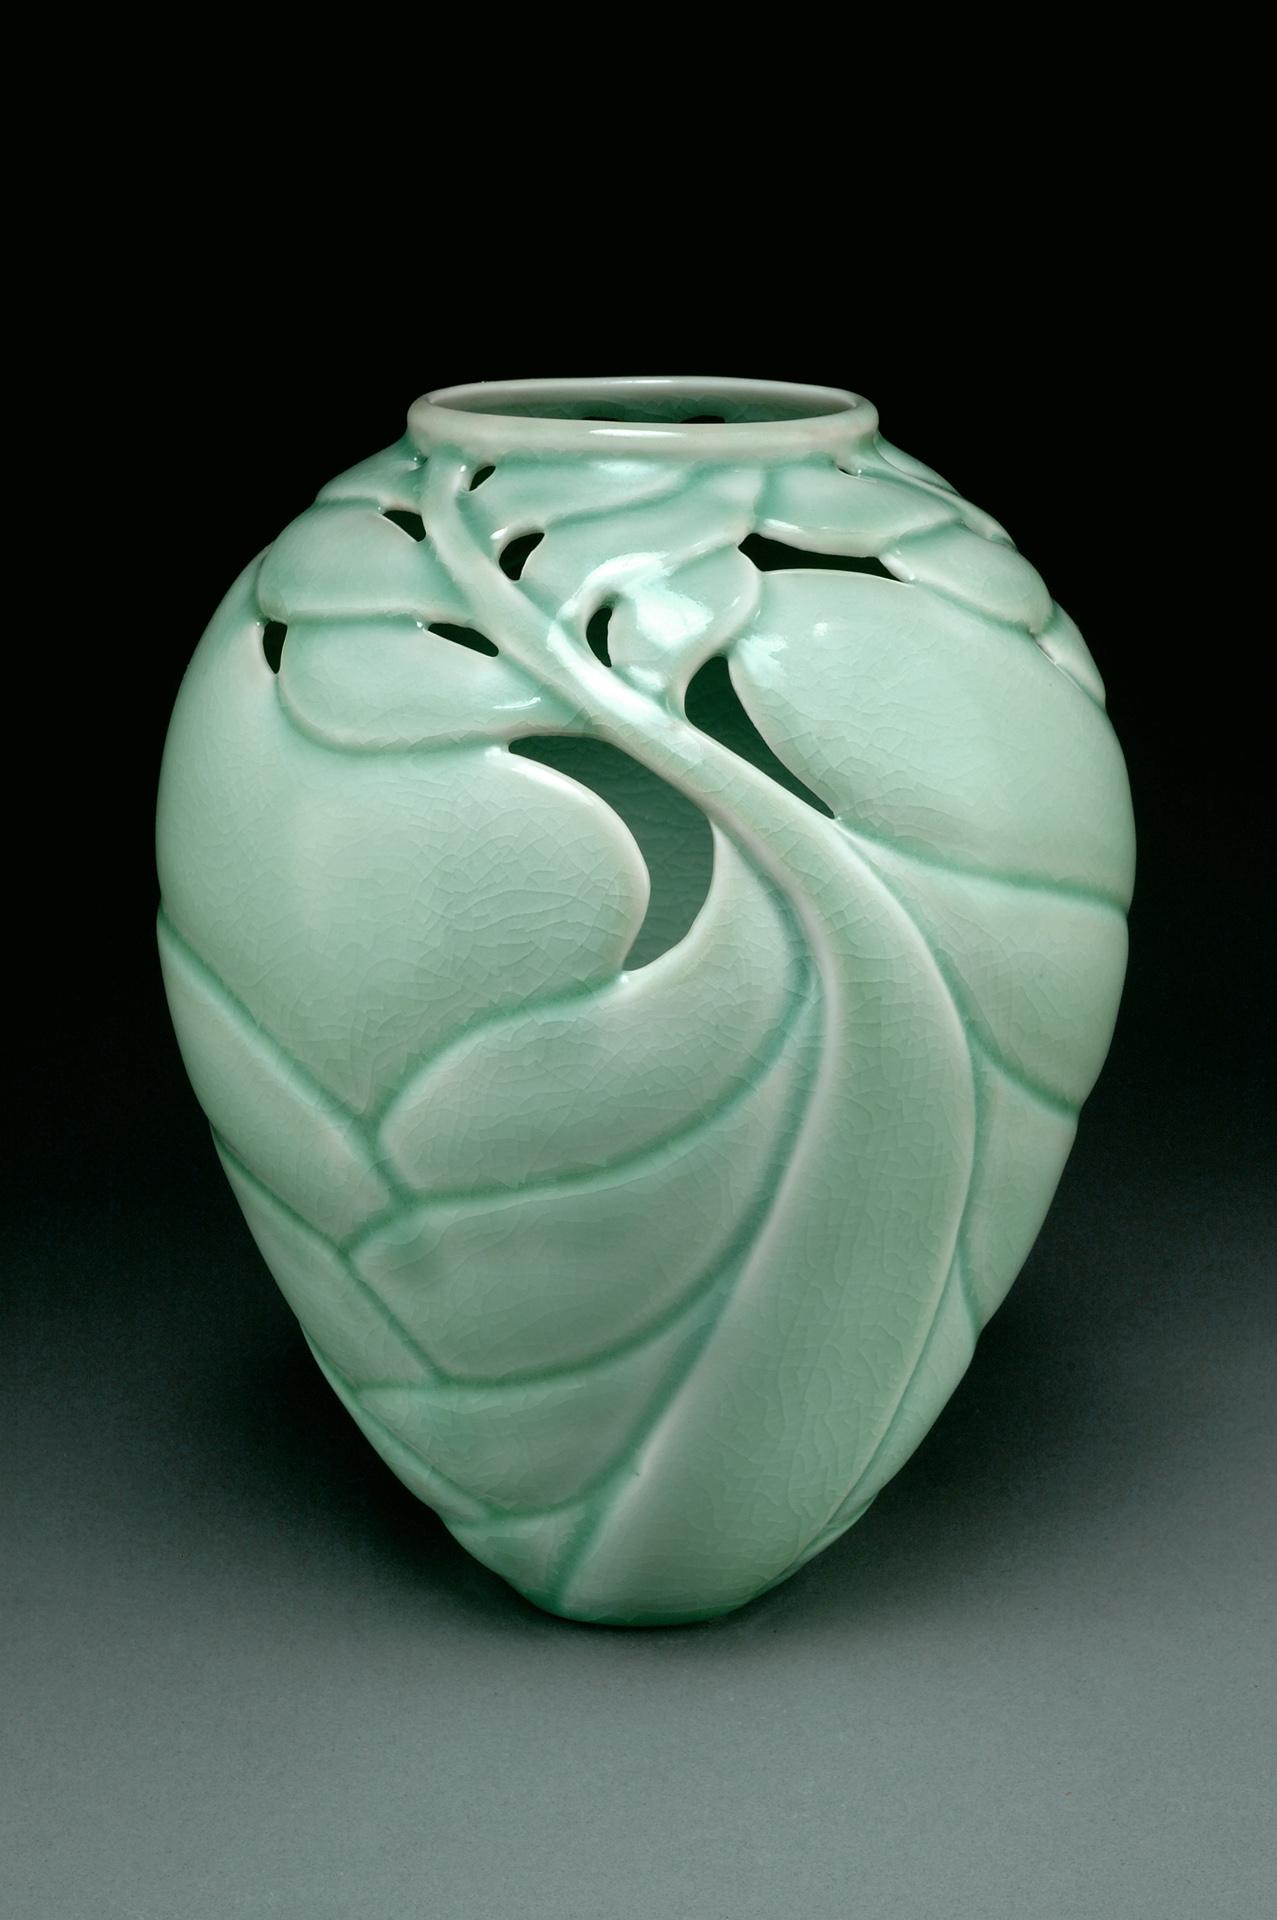 See Through Vase